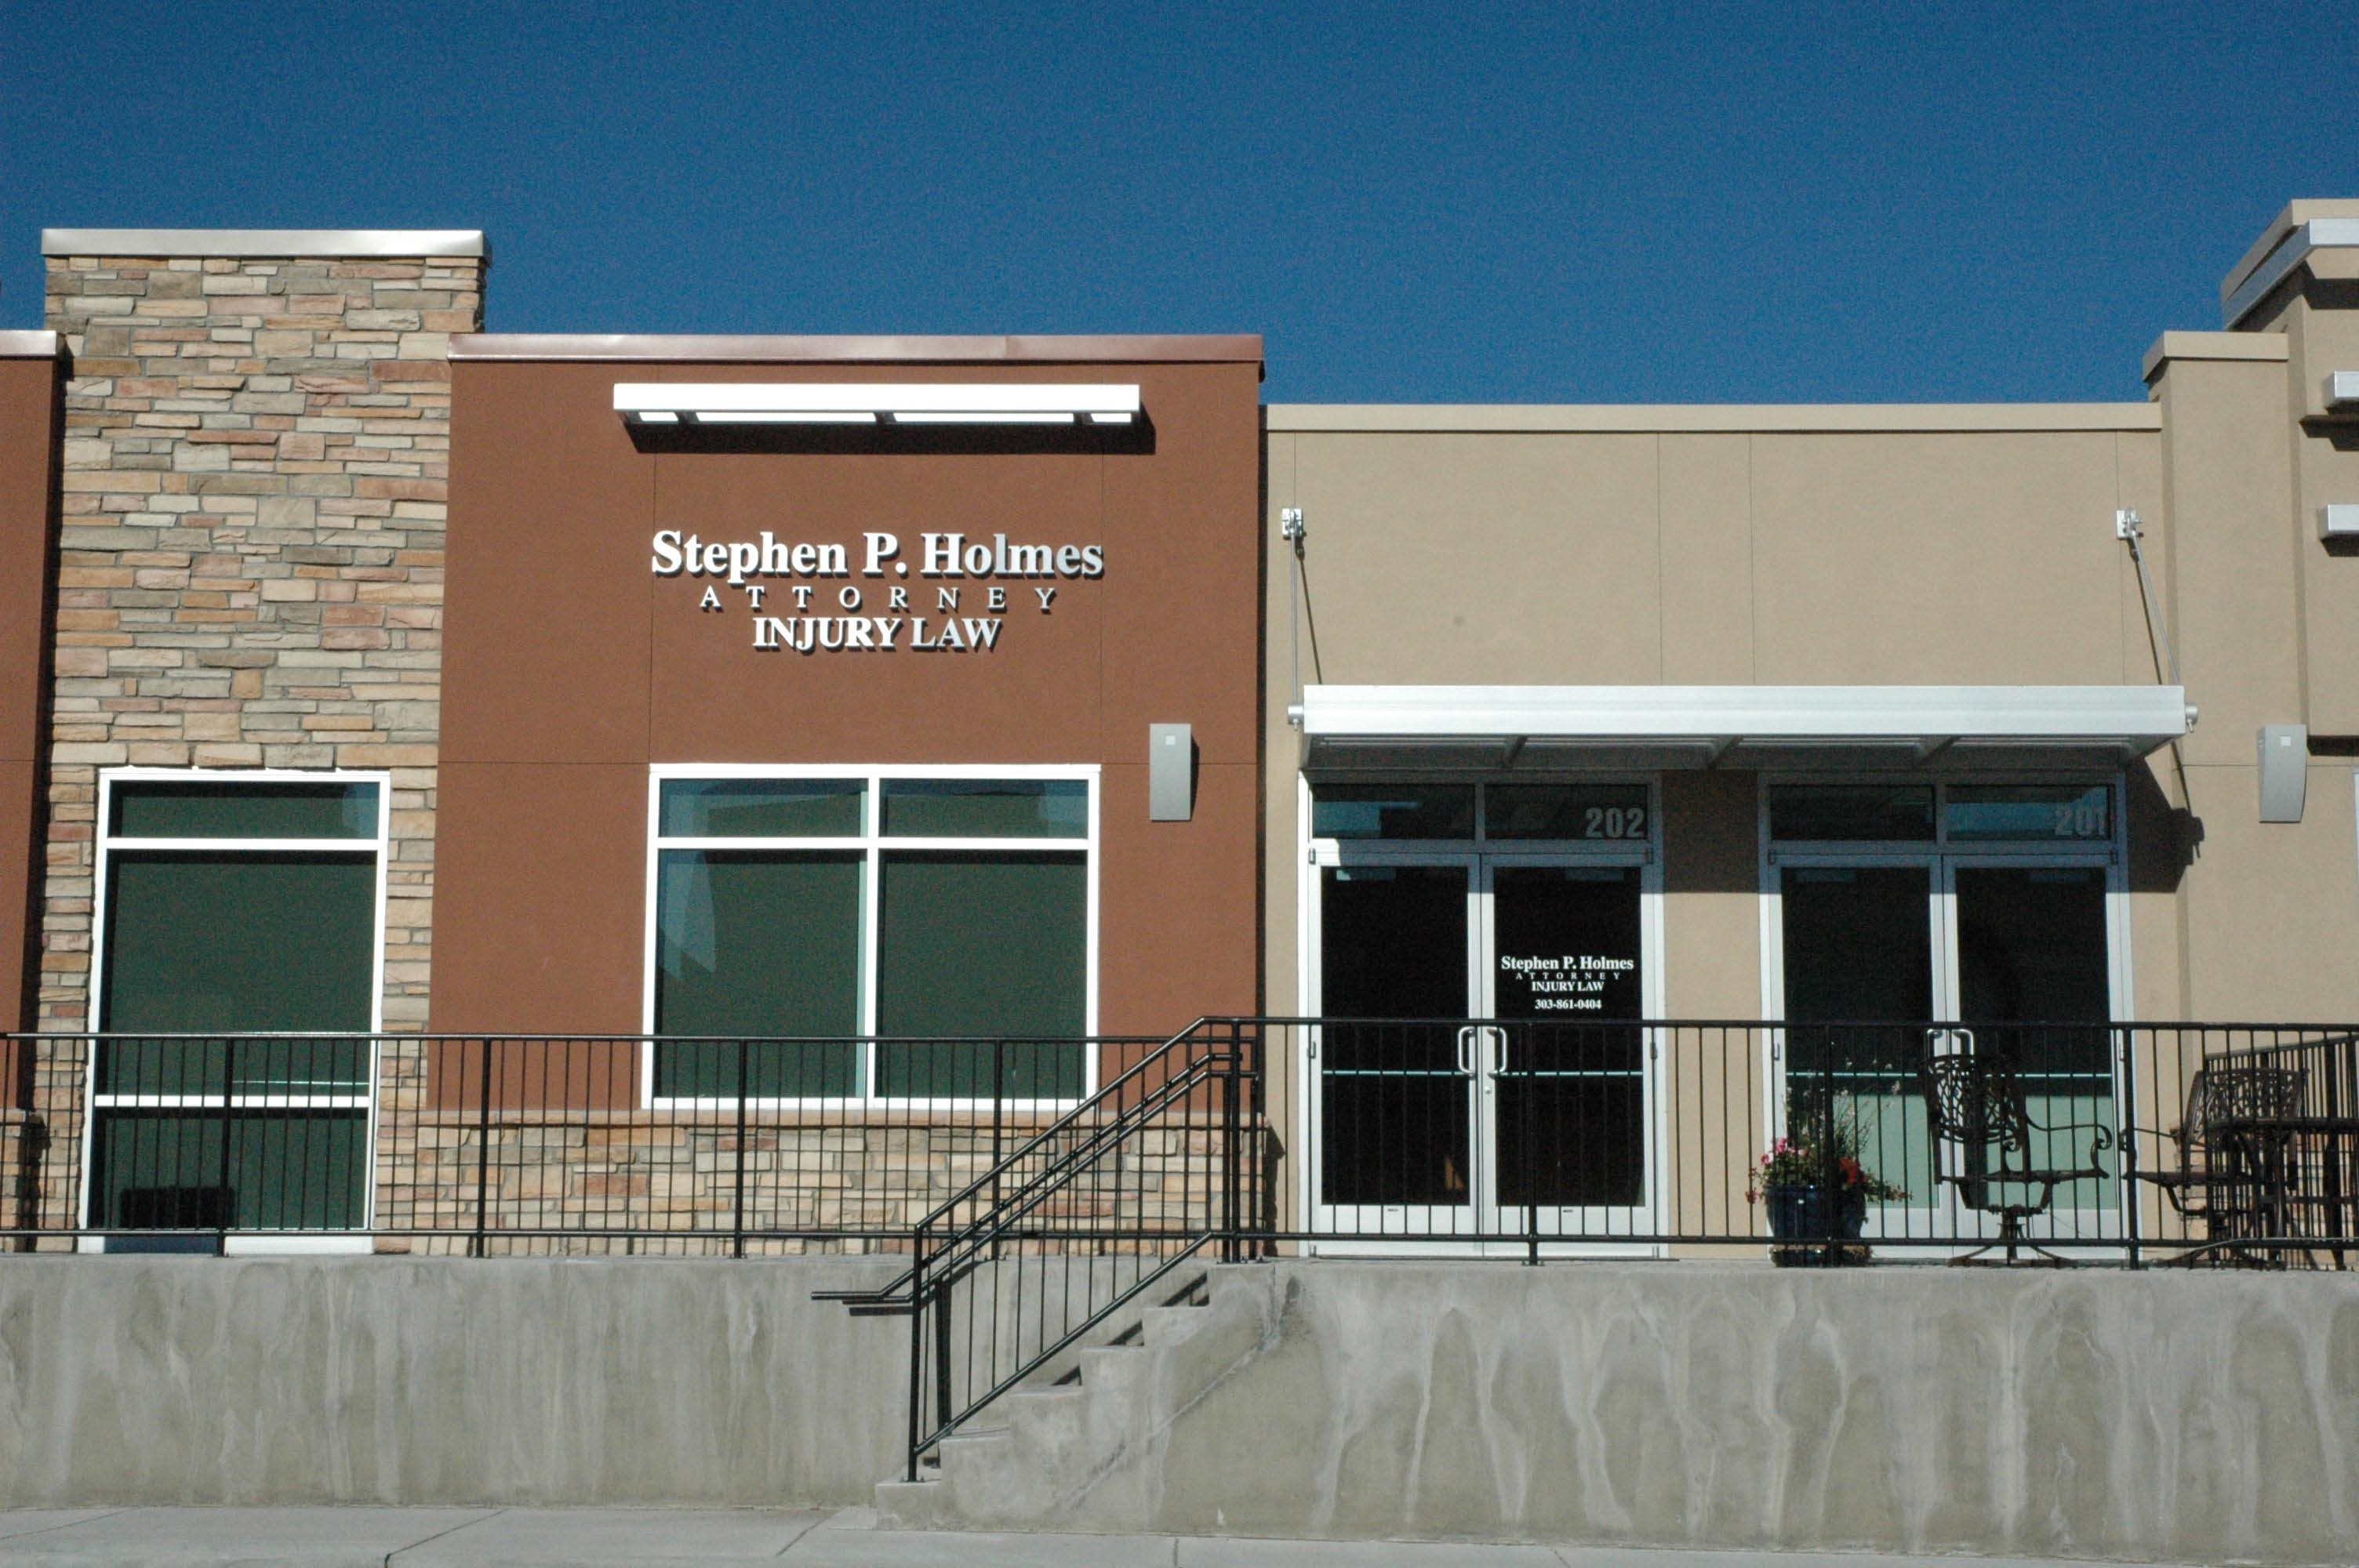 Stephen P. Holmes